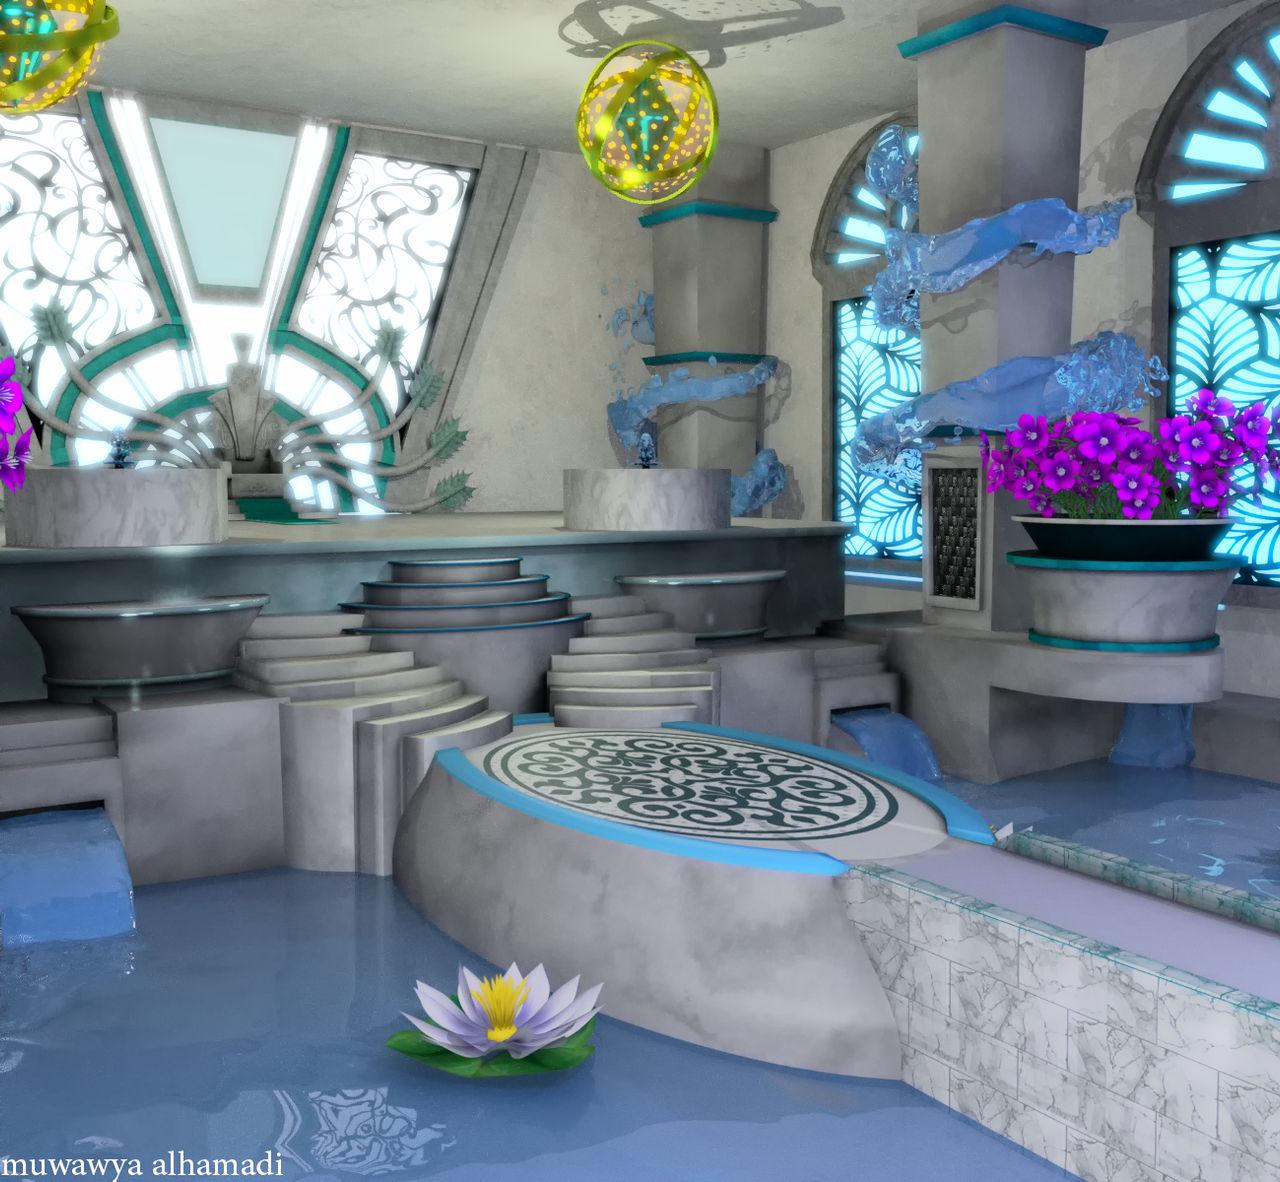 Throne room by muwawya-alhamadi